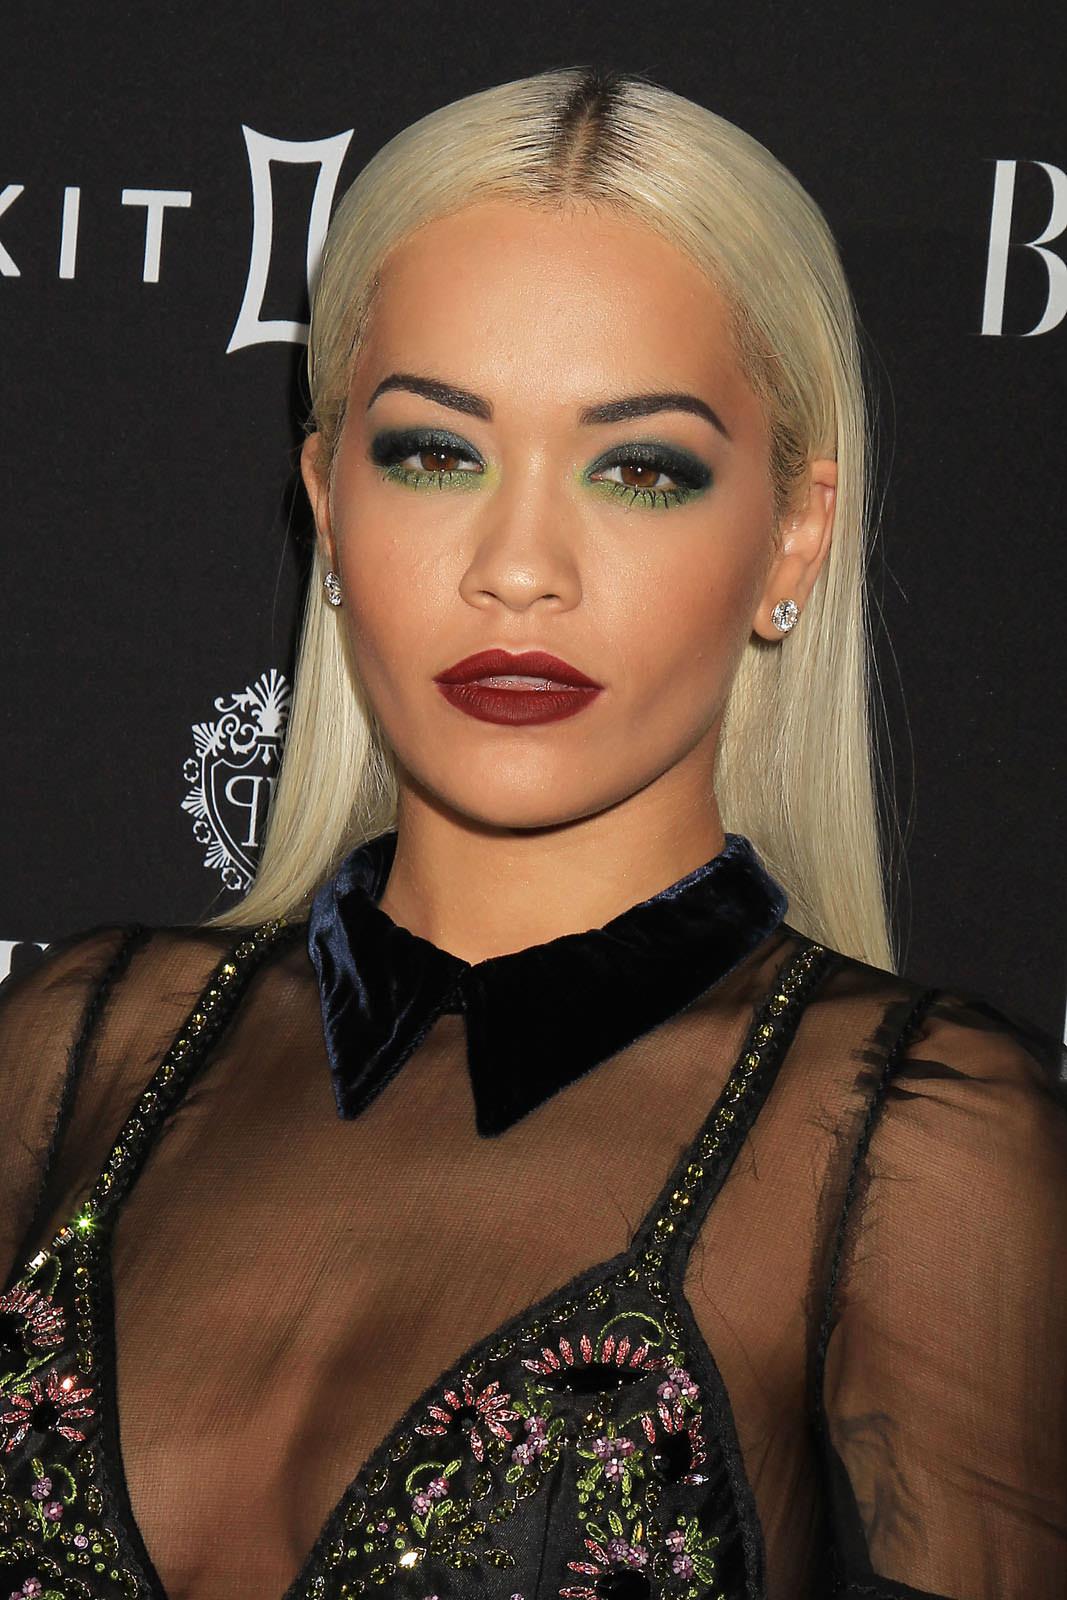 Rita Ora Photo Gallery